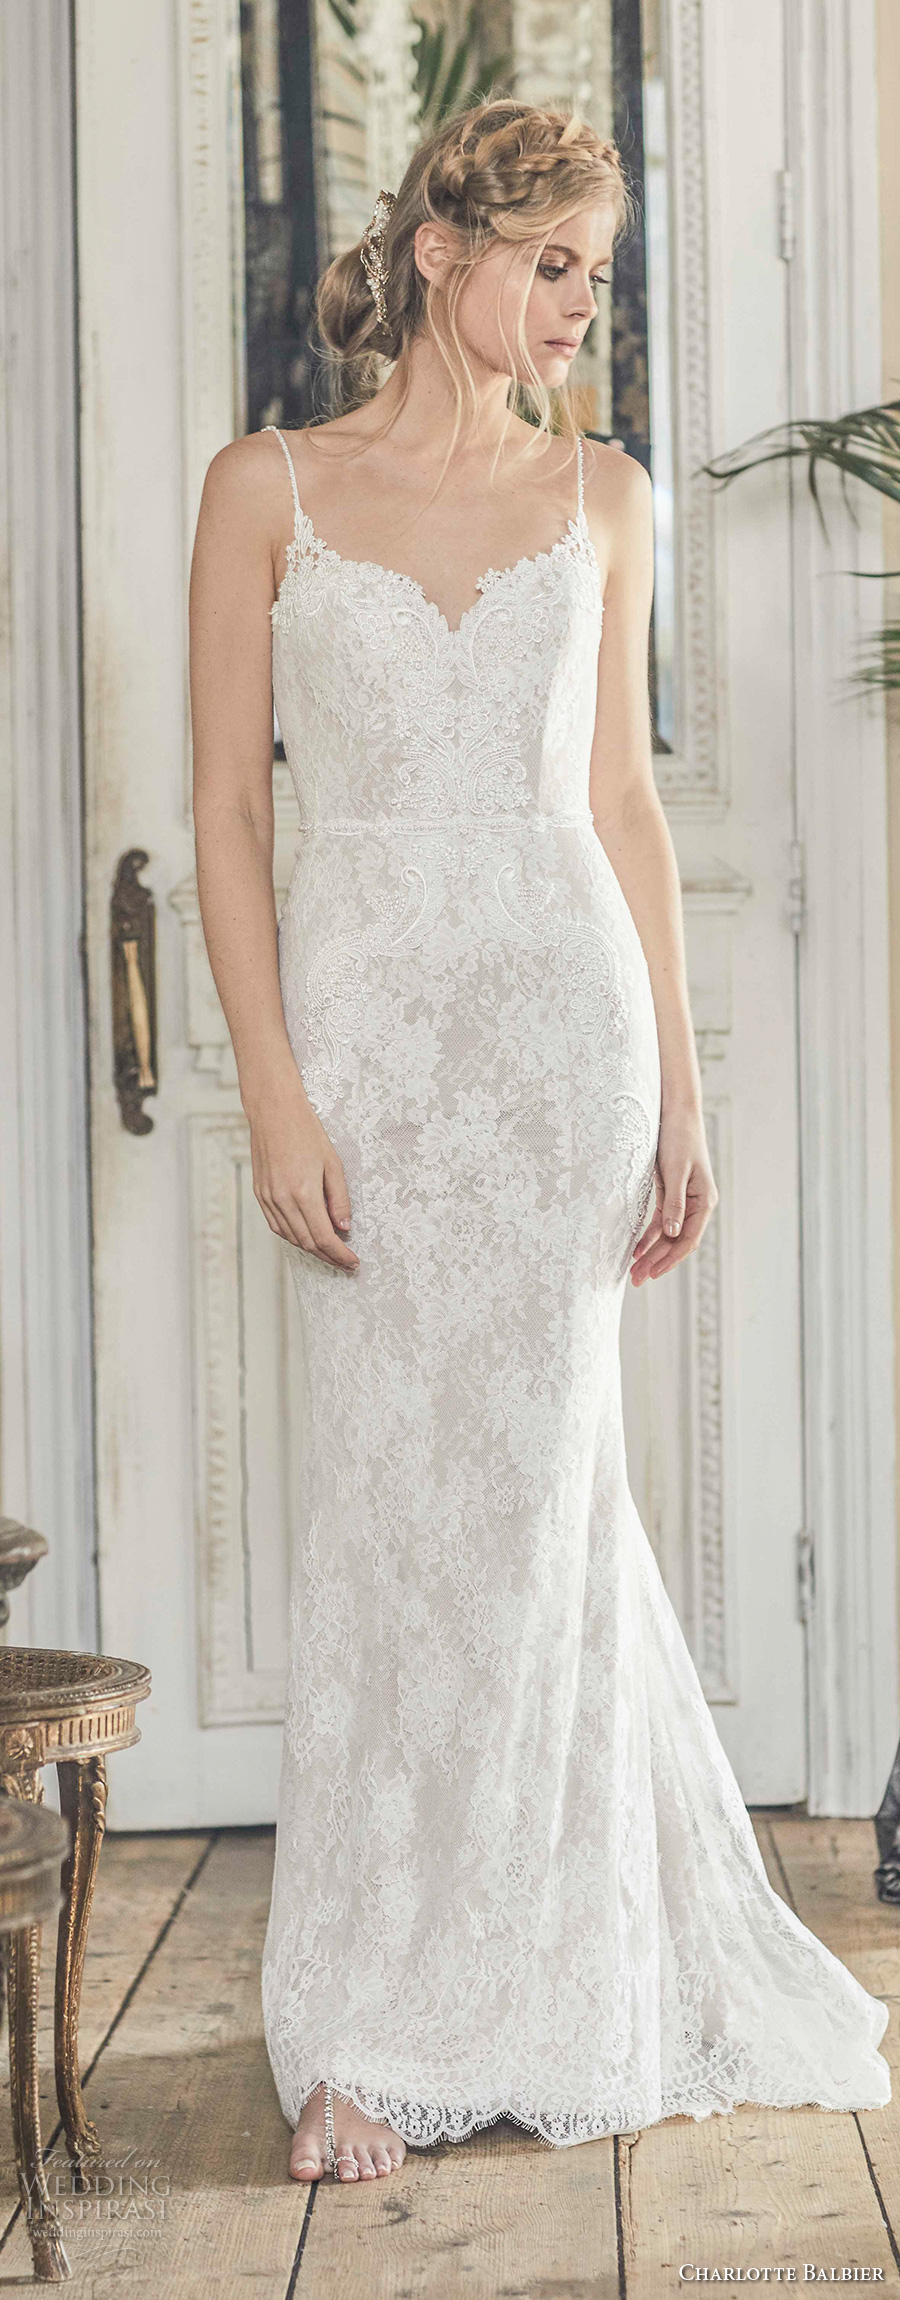 charlotte balbier 2018 bridal spaghetti strap sweetheart neckline full embellishment elegant romantic sheath wedding dress open back sweep train (nyree) mv